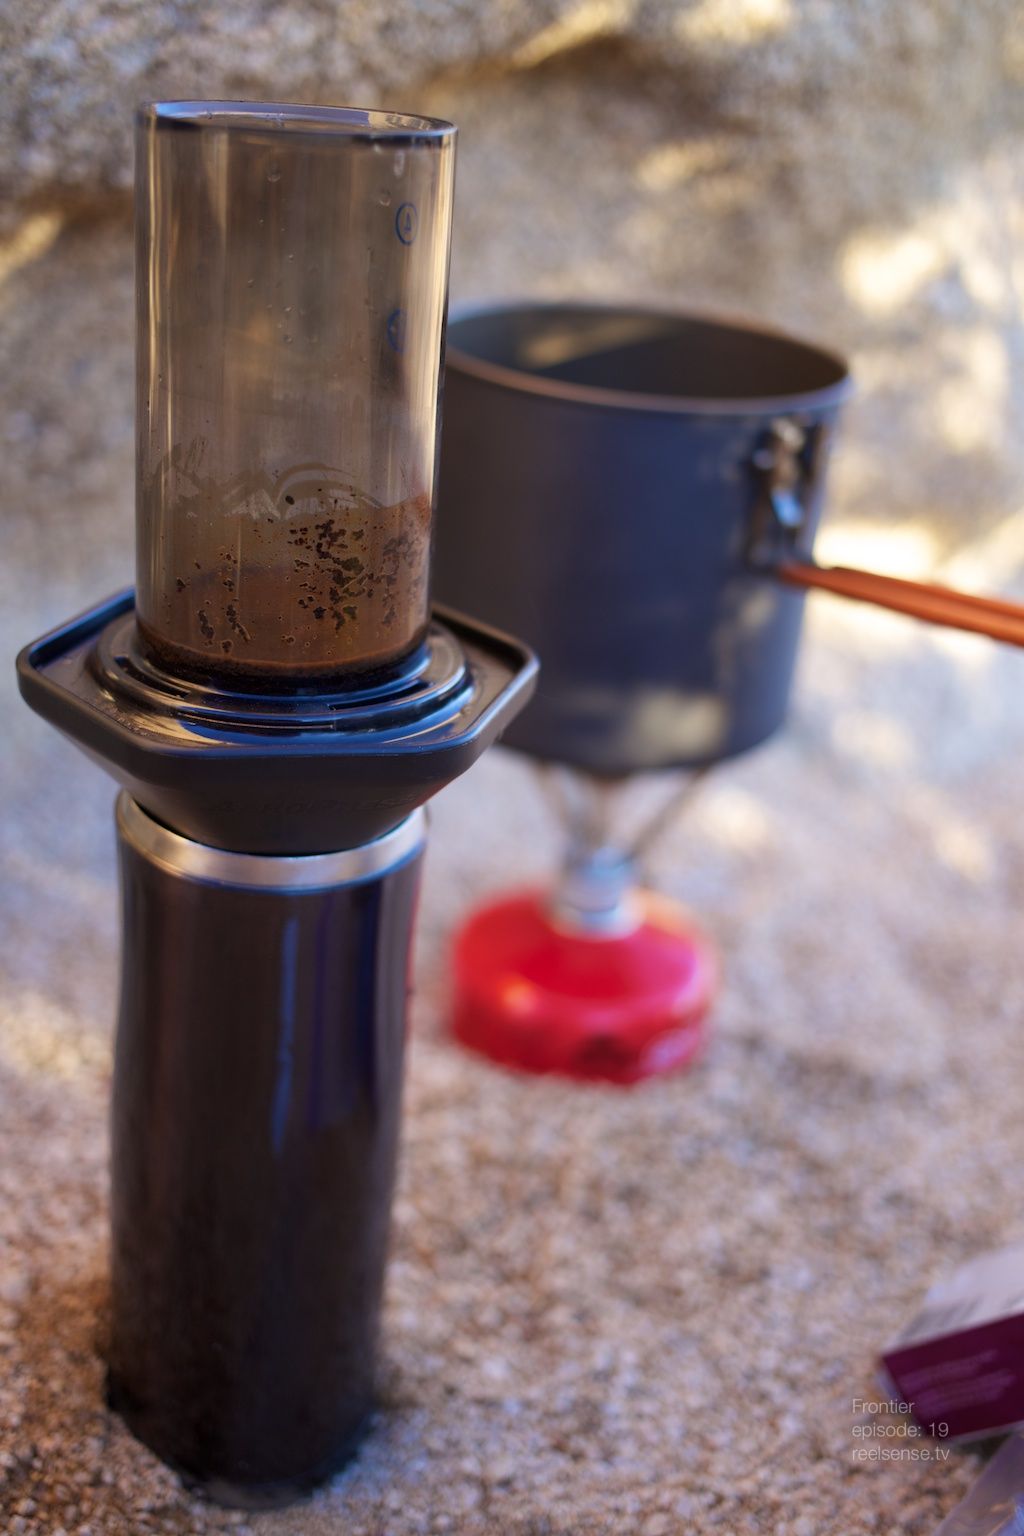 Joshua Tree - AeroPress coffee maker and MSR Pocket Rocket